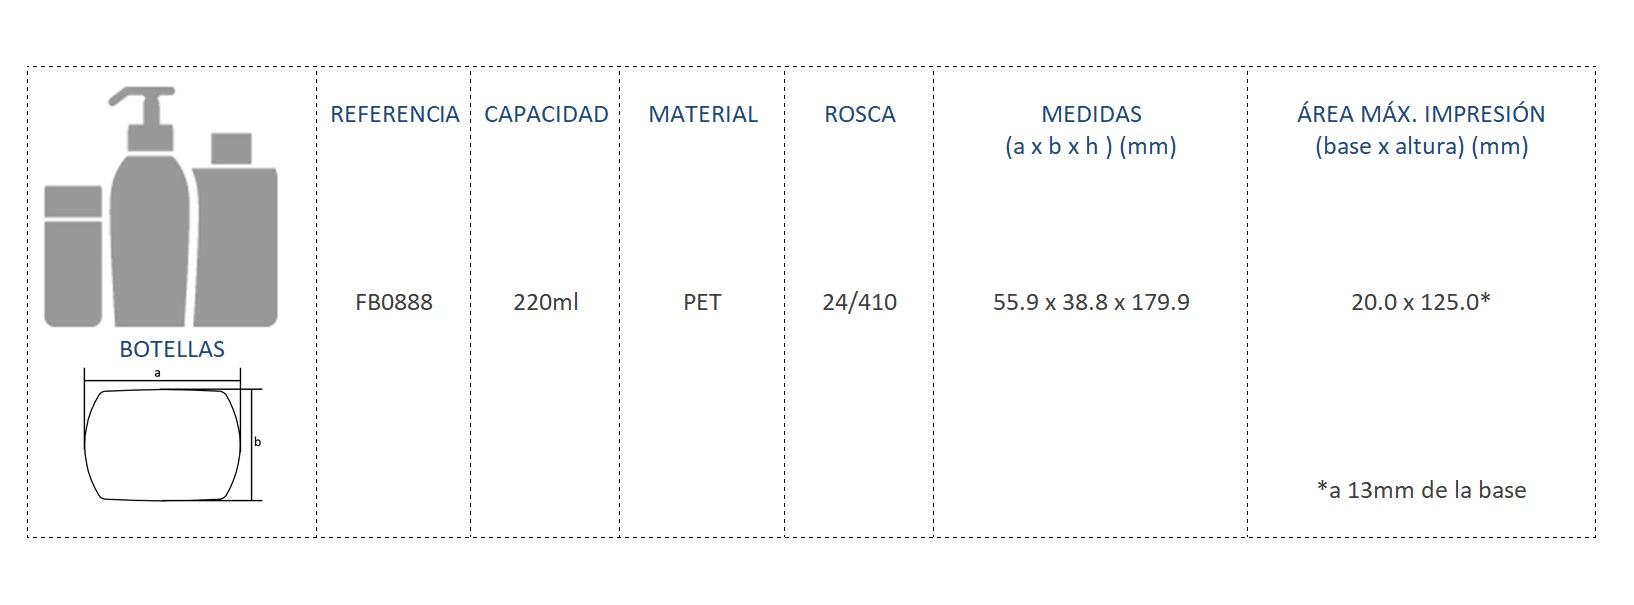 Cuadro de materiales botella FB0888